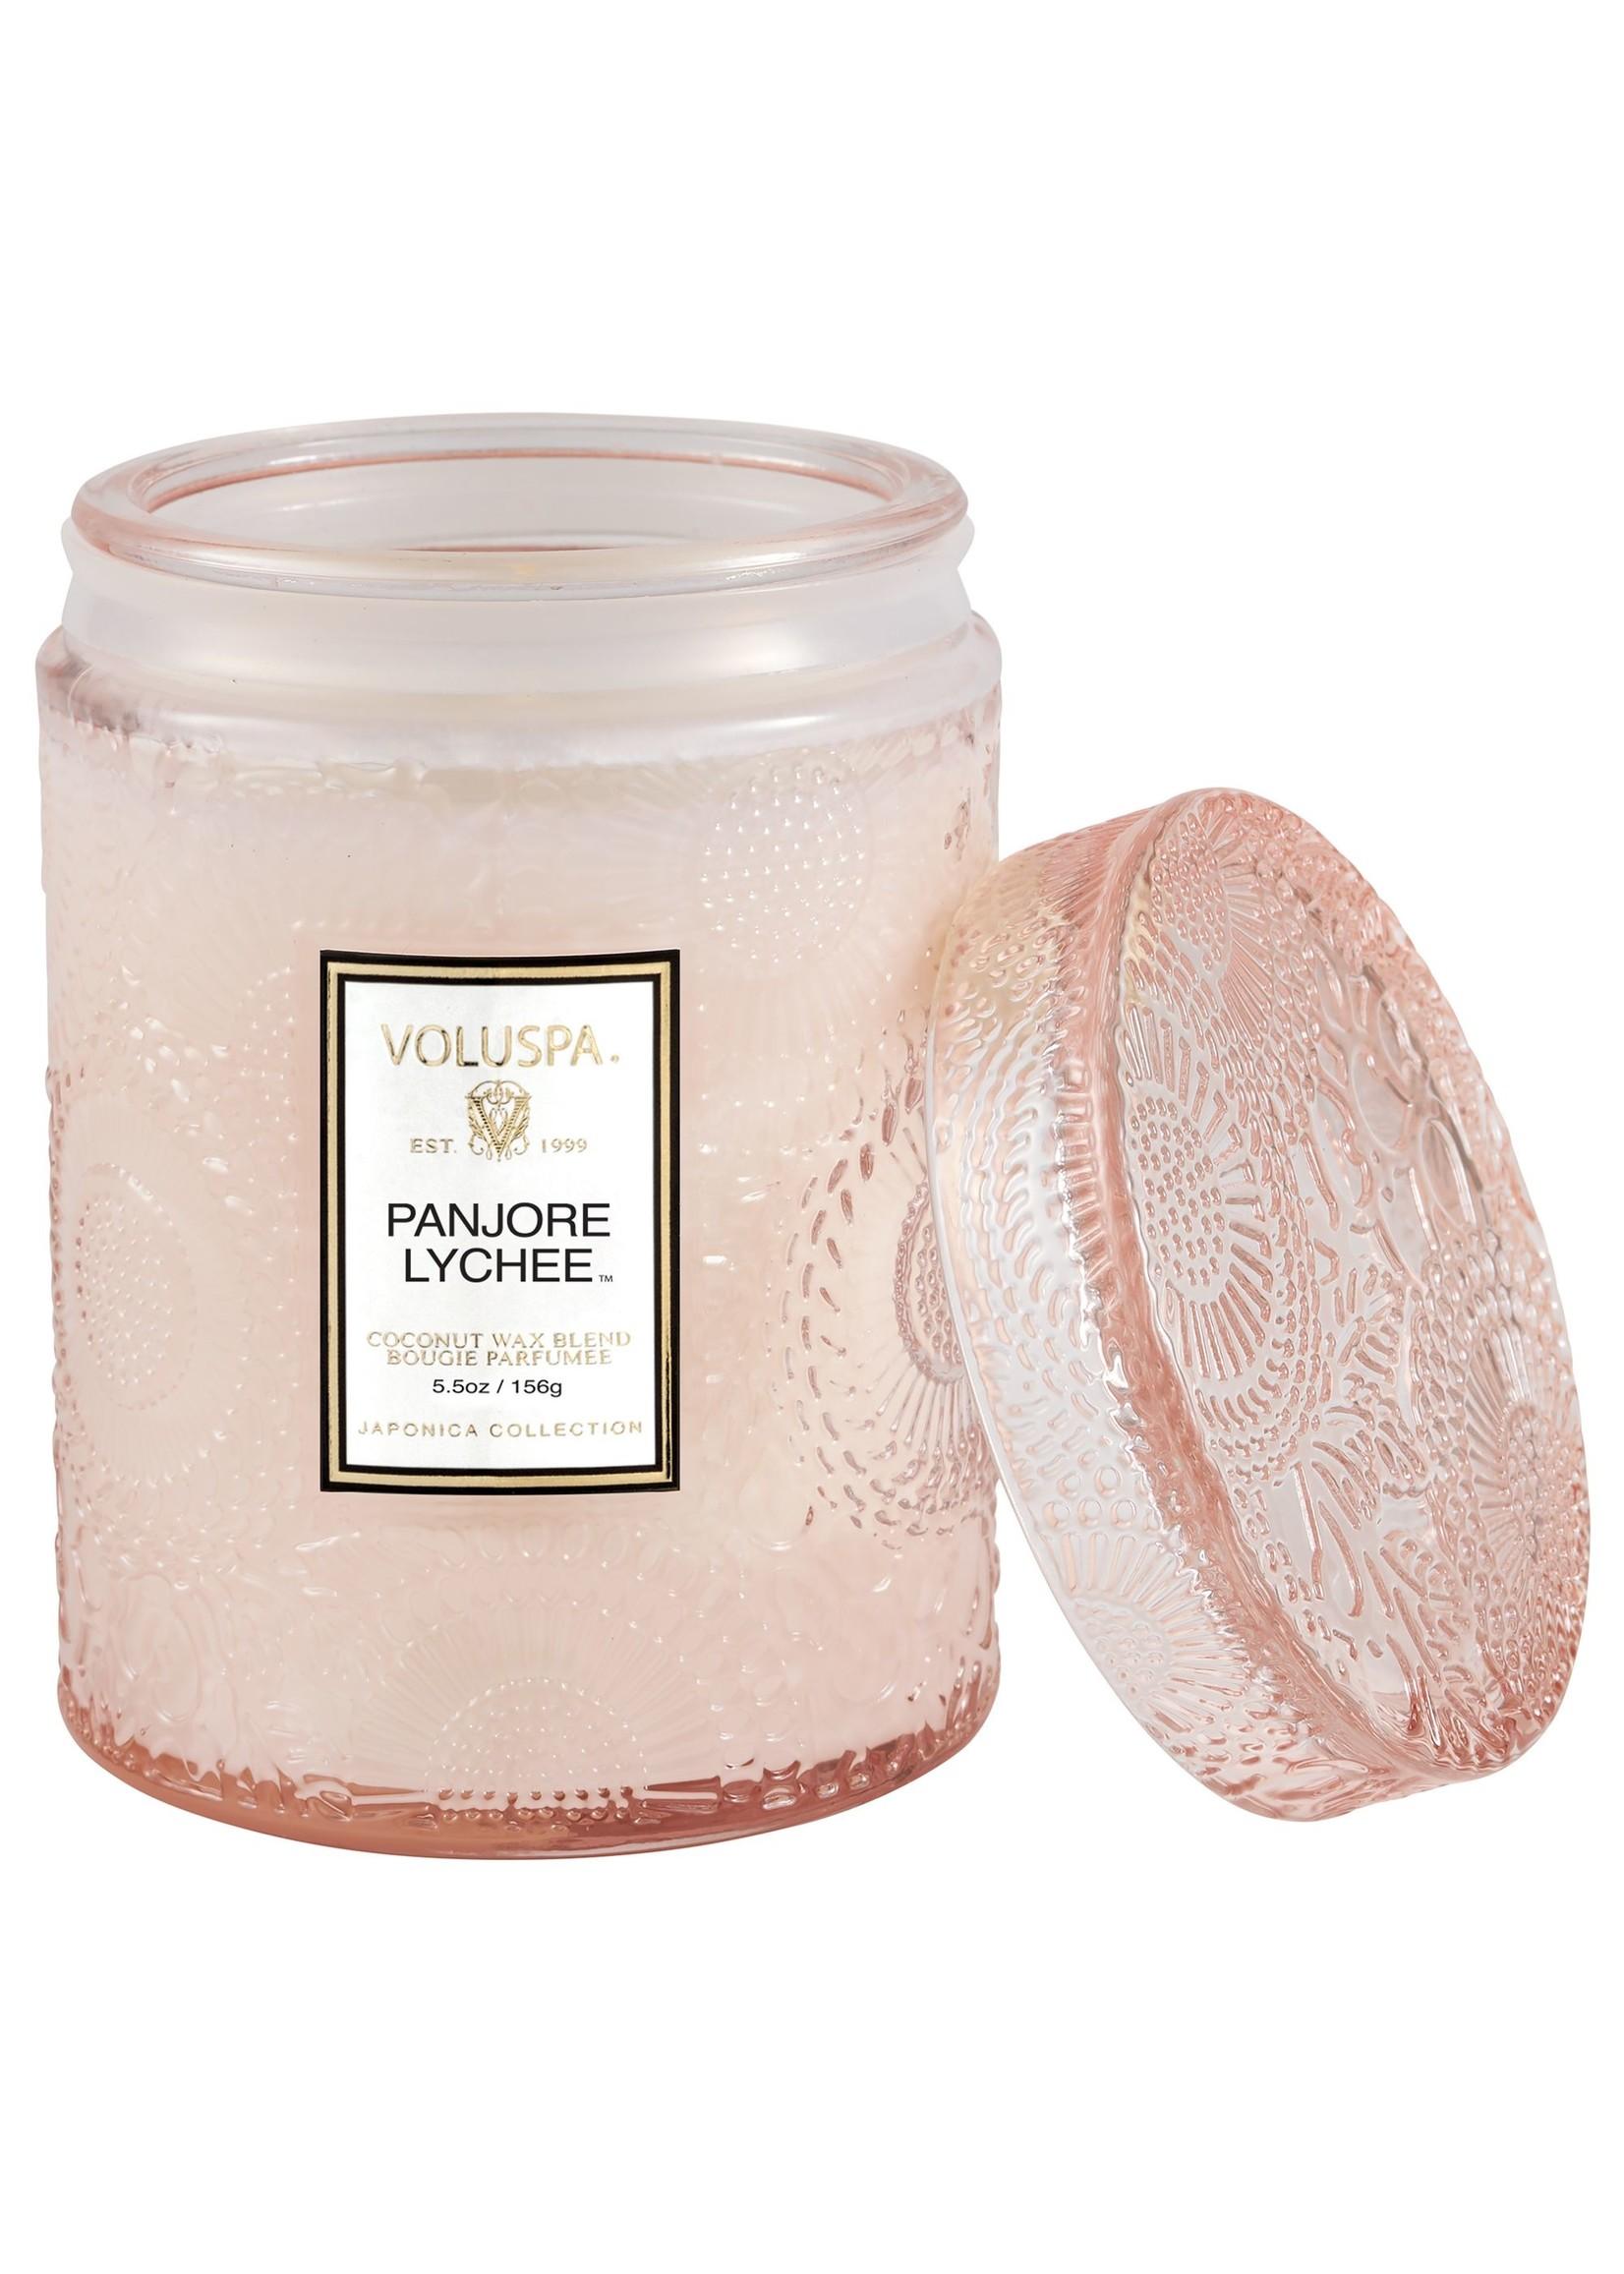 Voluspa Panjore Lychee Small Jar Candle